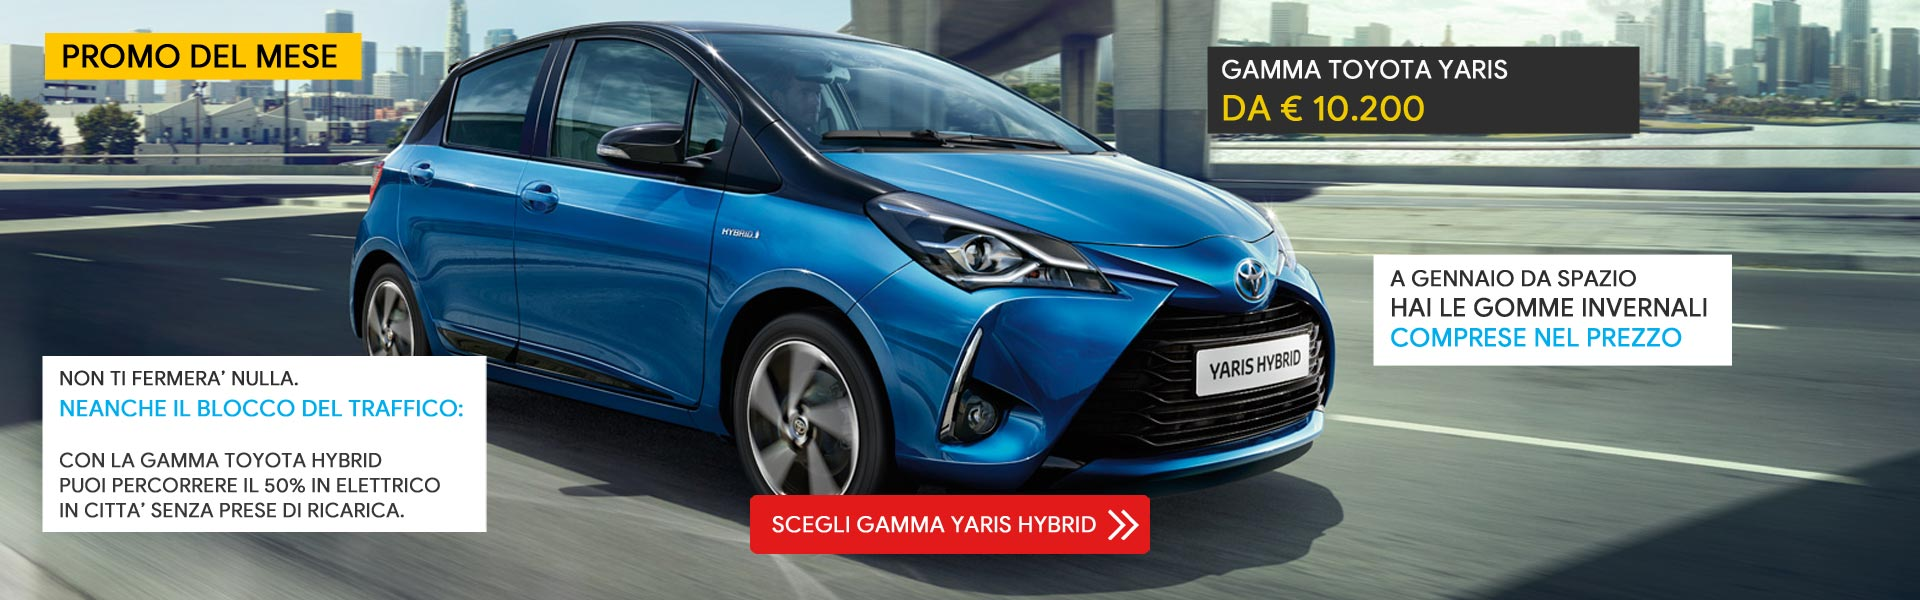 Gamma Toyota Yaris Hybrid